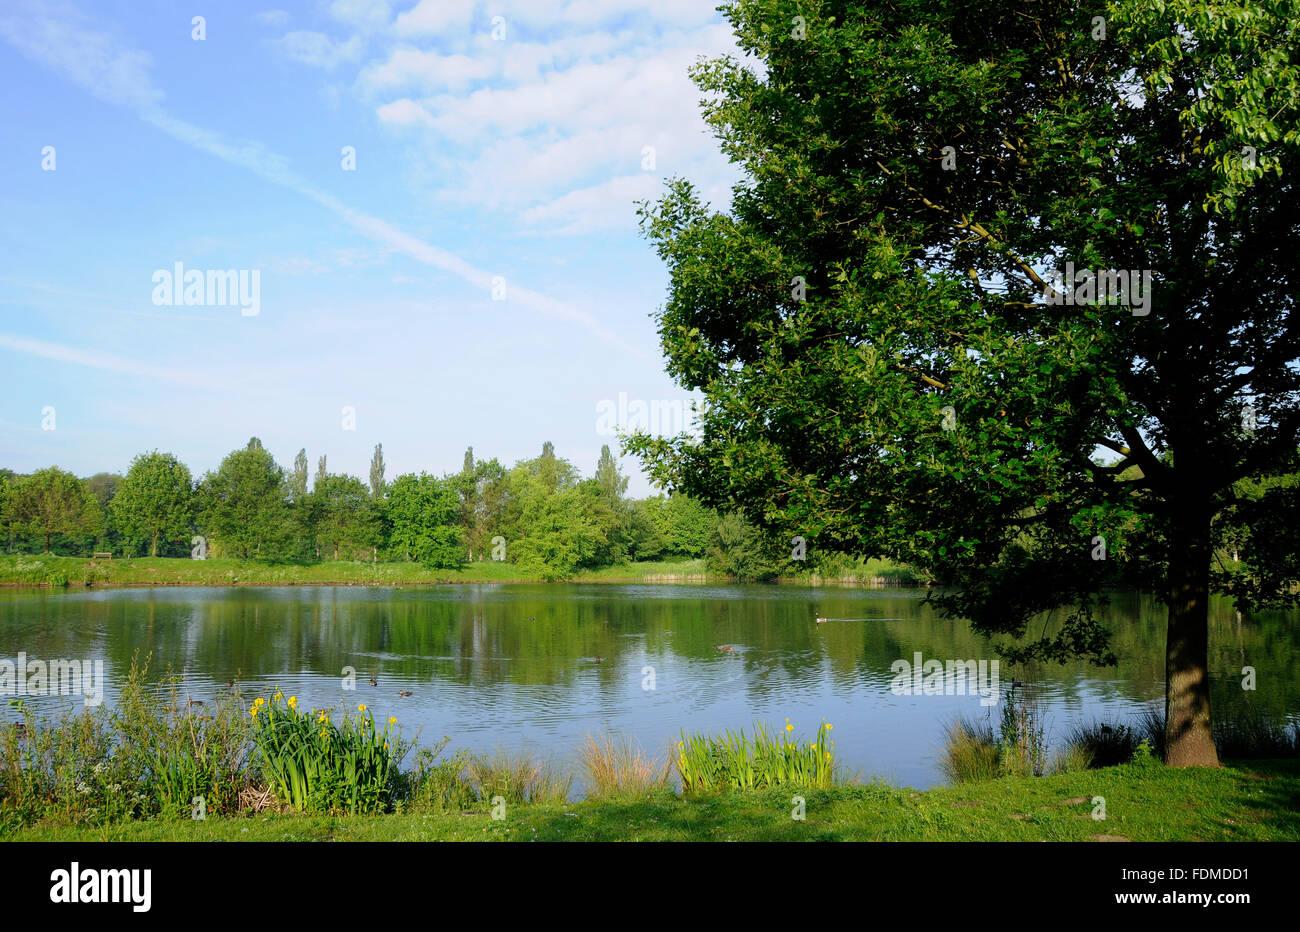 landscape,tecklenburger country - Stock Image